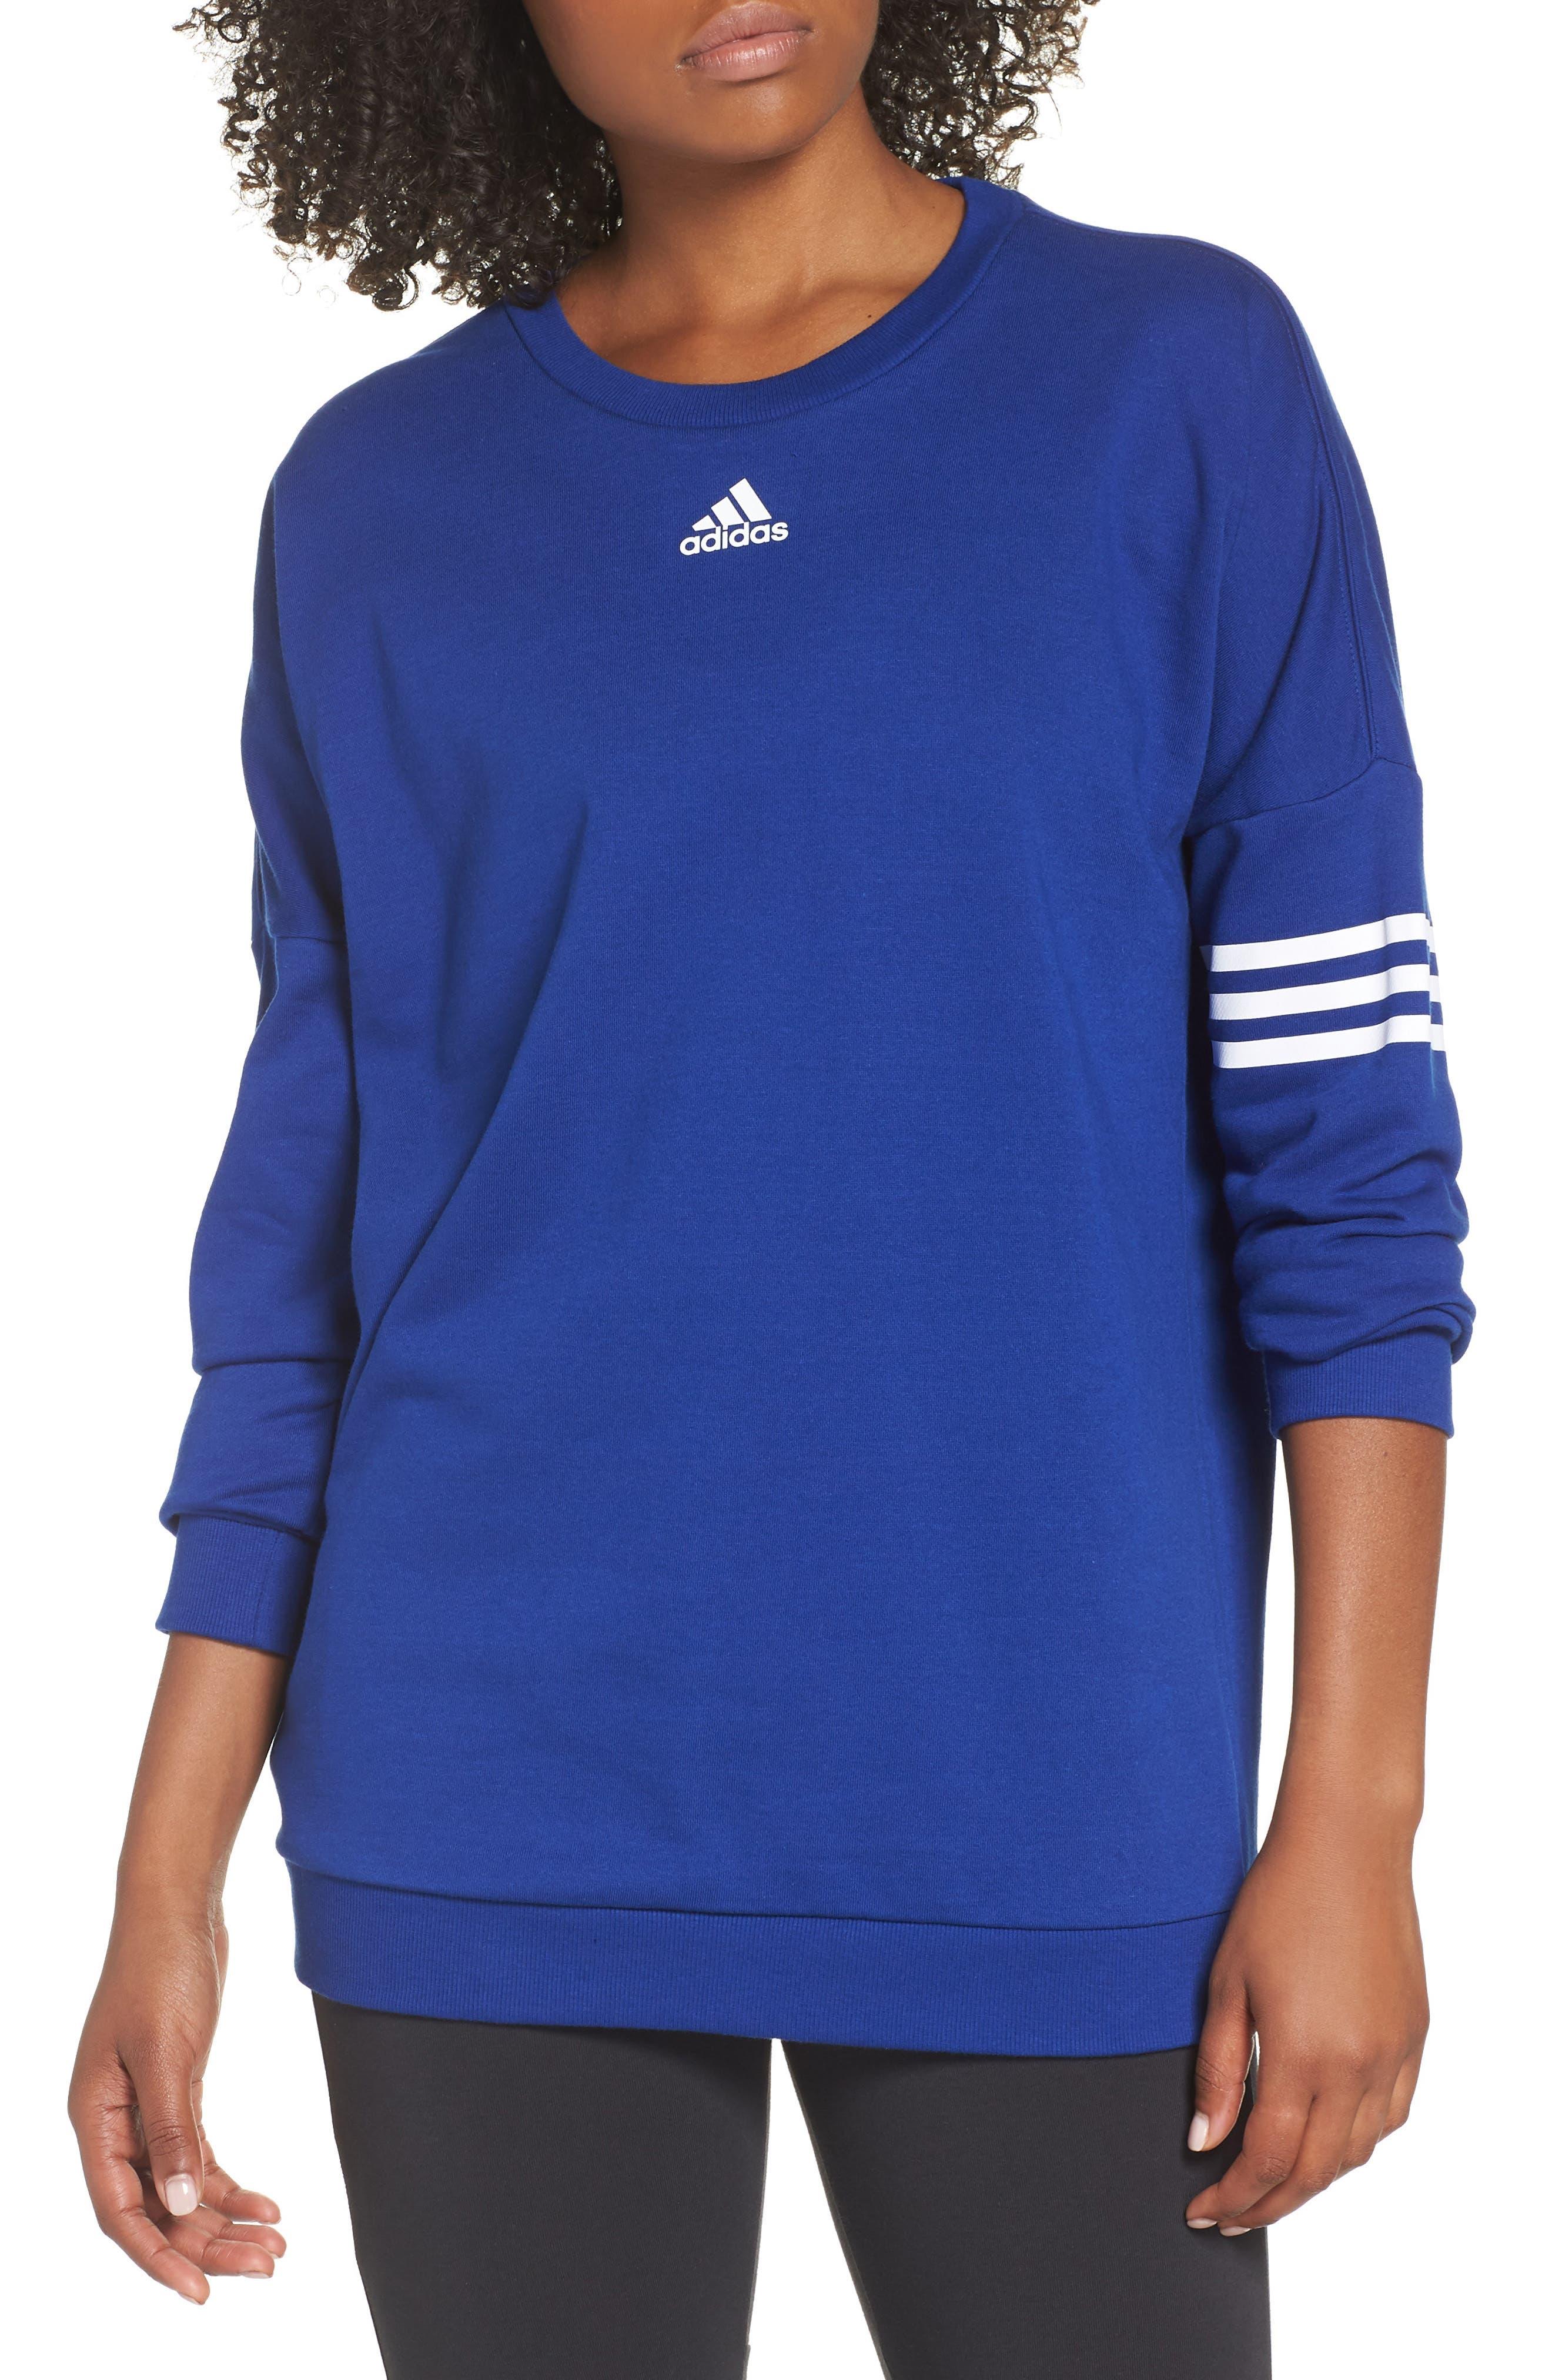 adidas Oversize Crewneck Sweatshirt,                         Main,                         color, MYSTERY INK